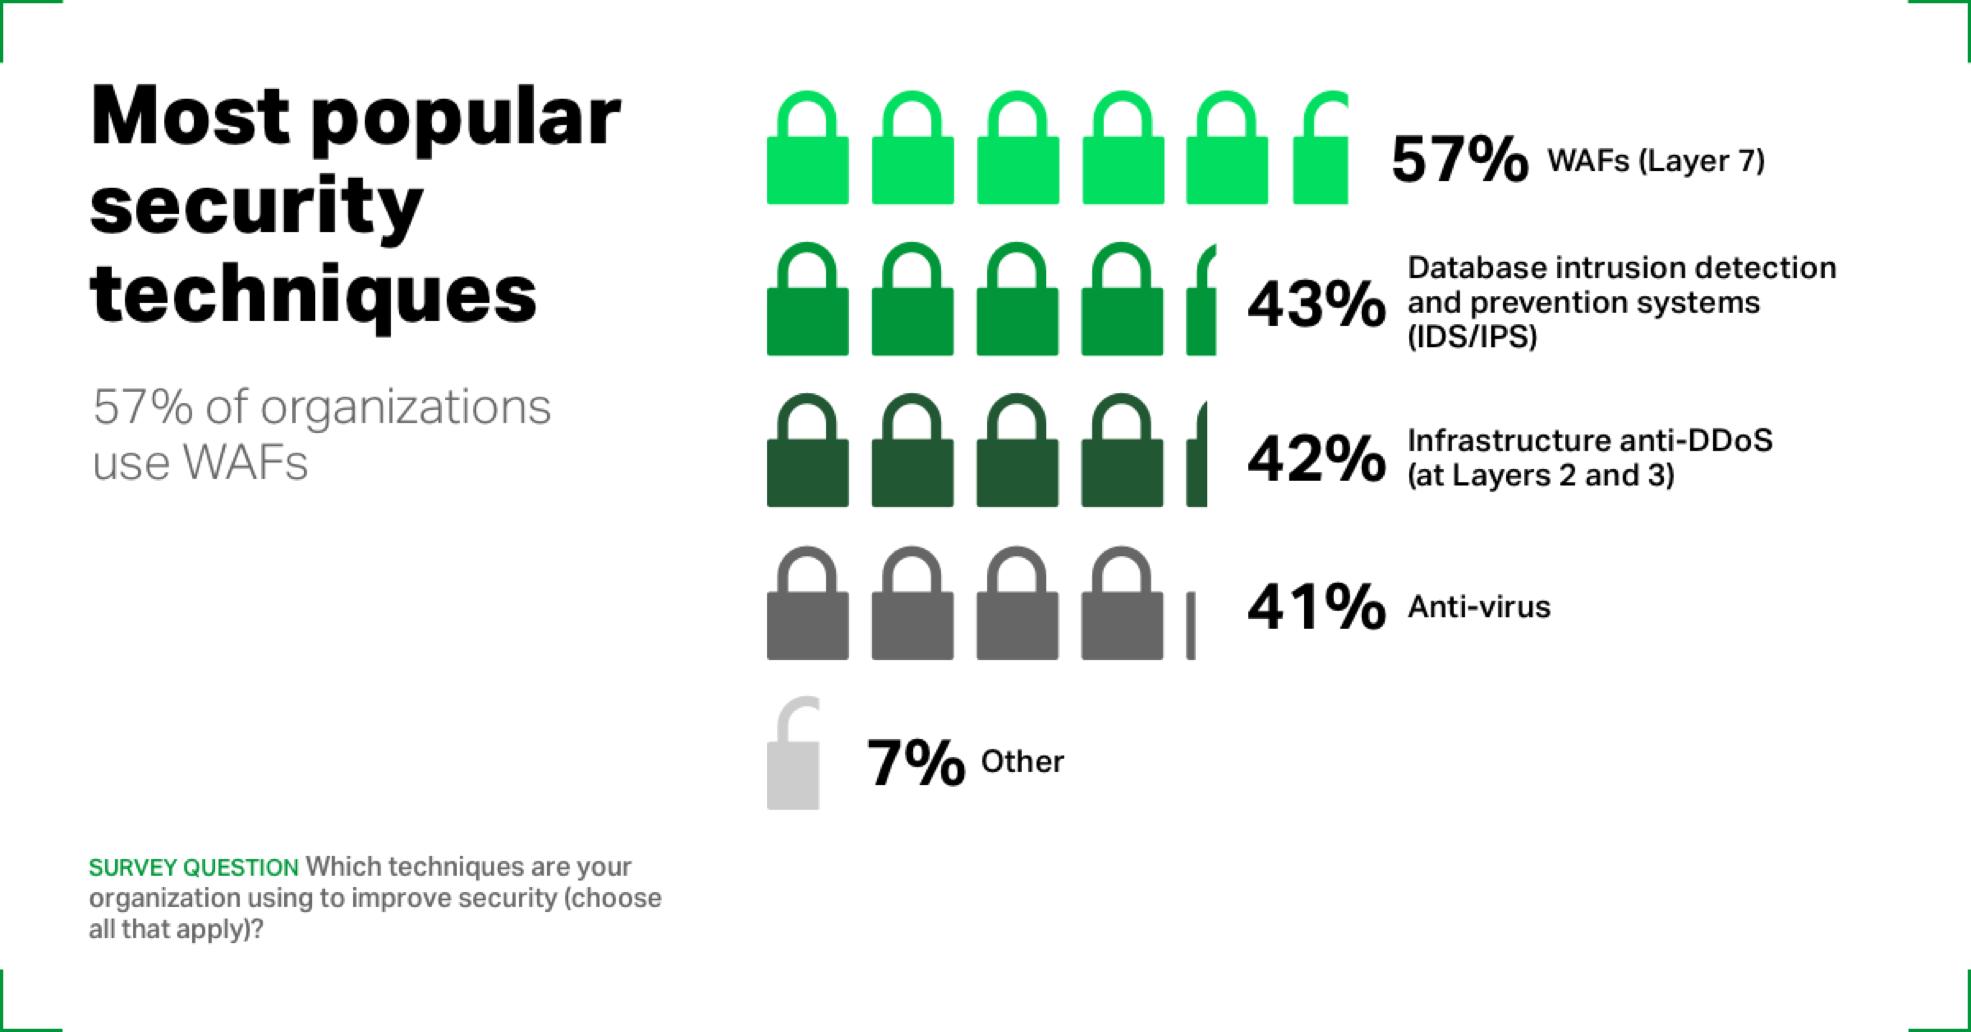 nginx infographic 6